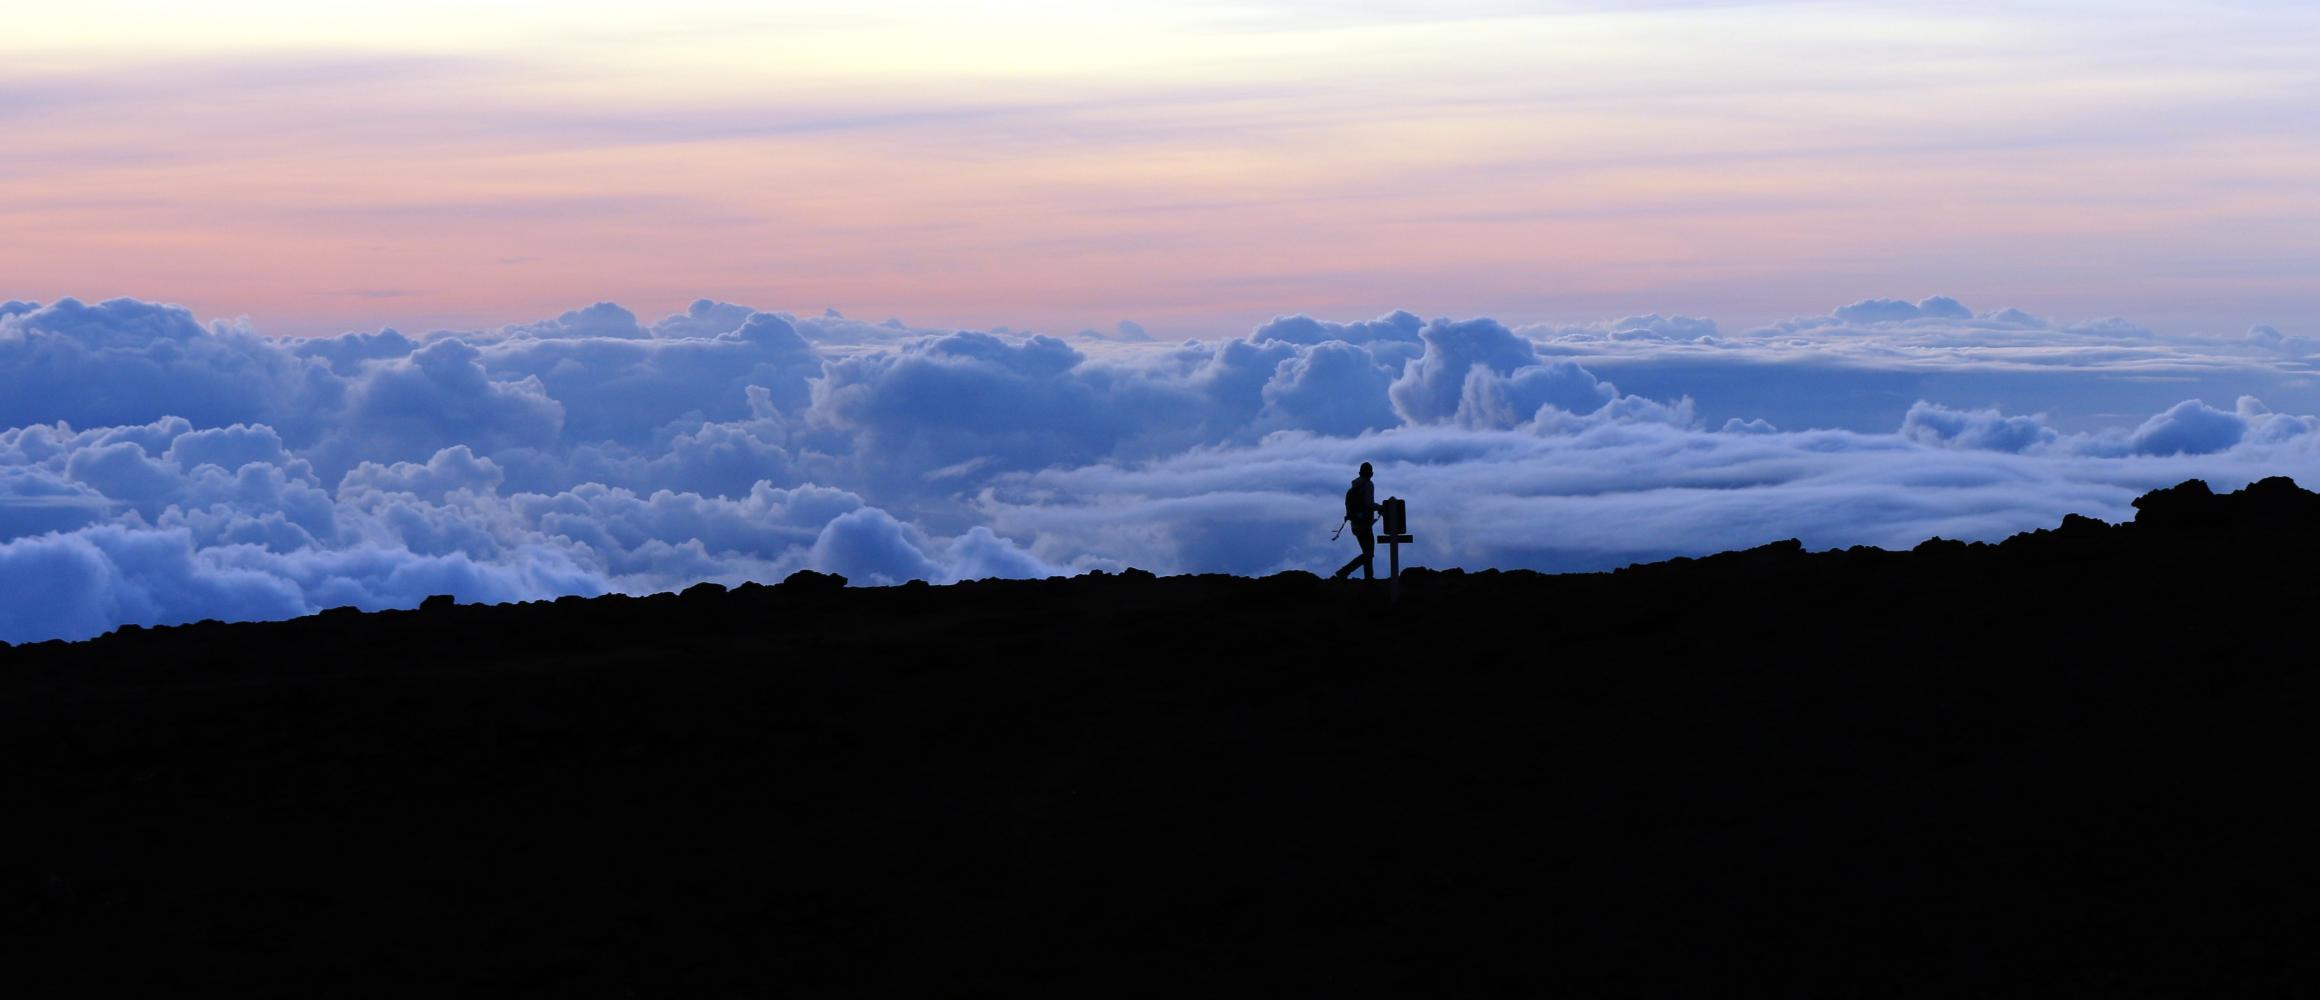 Haleakala, HI, USA - PJAMM Cycling - Climb of the Week